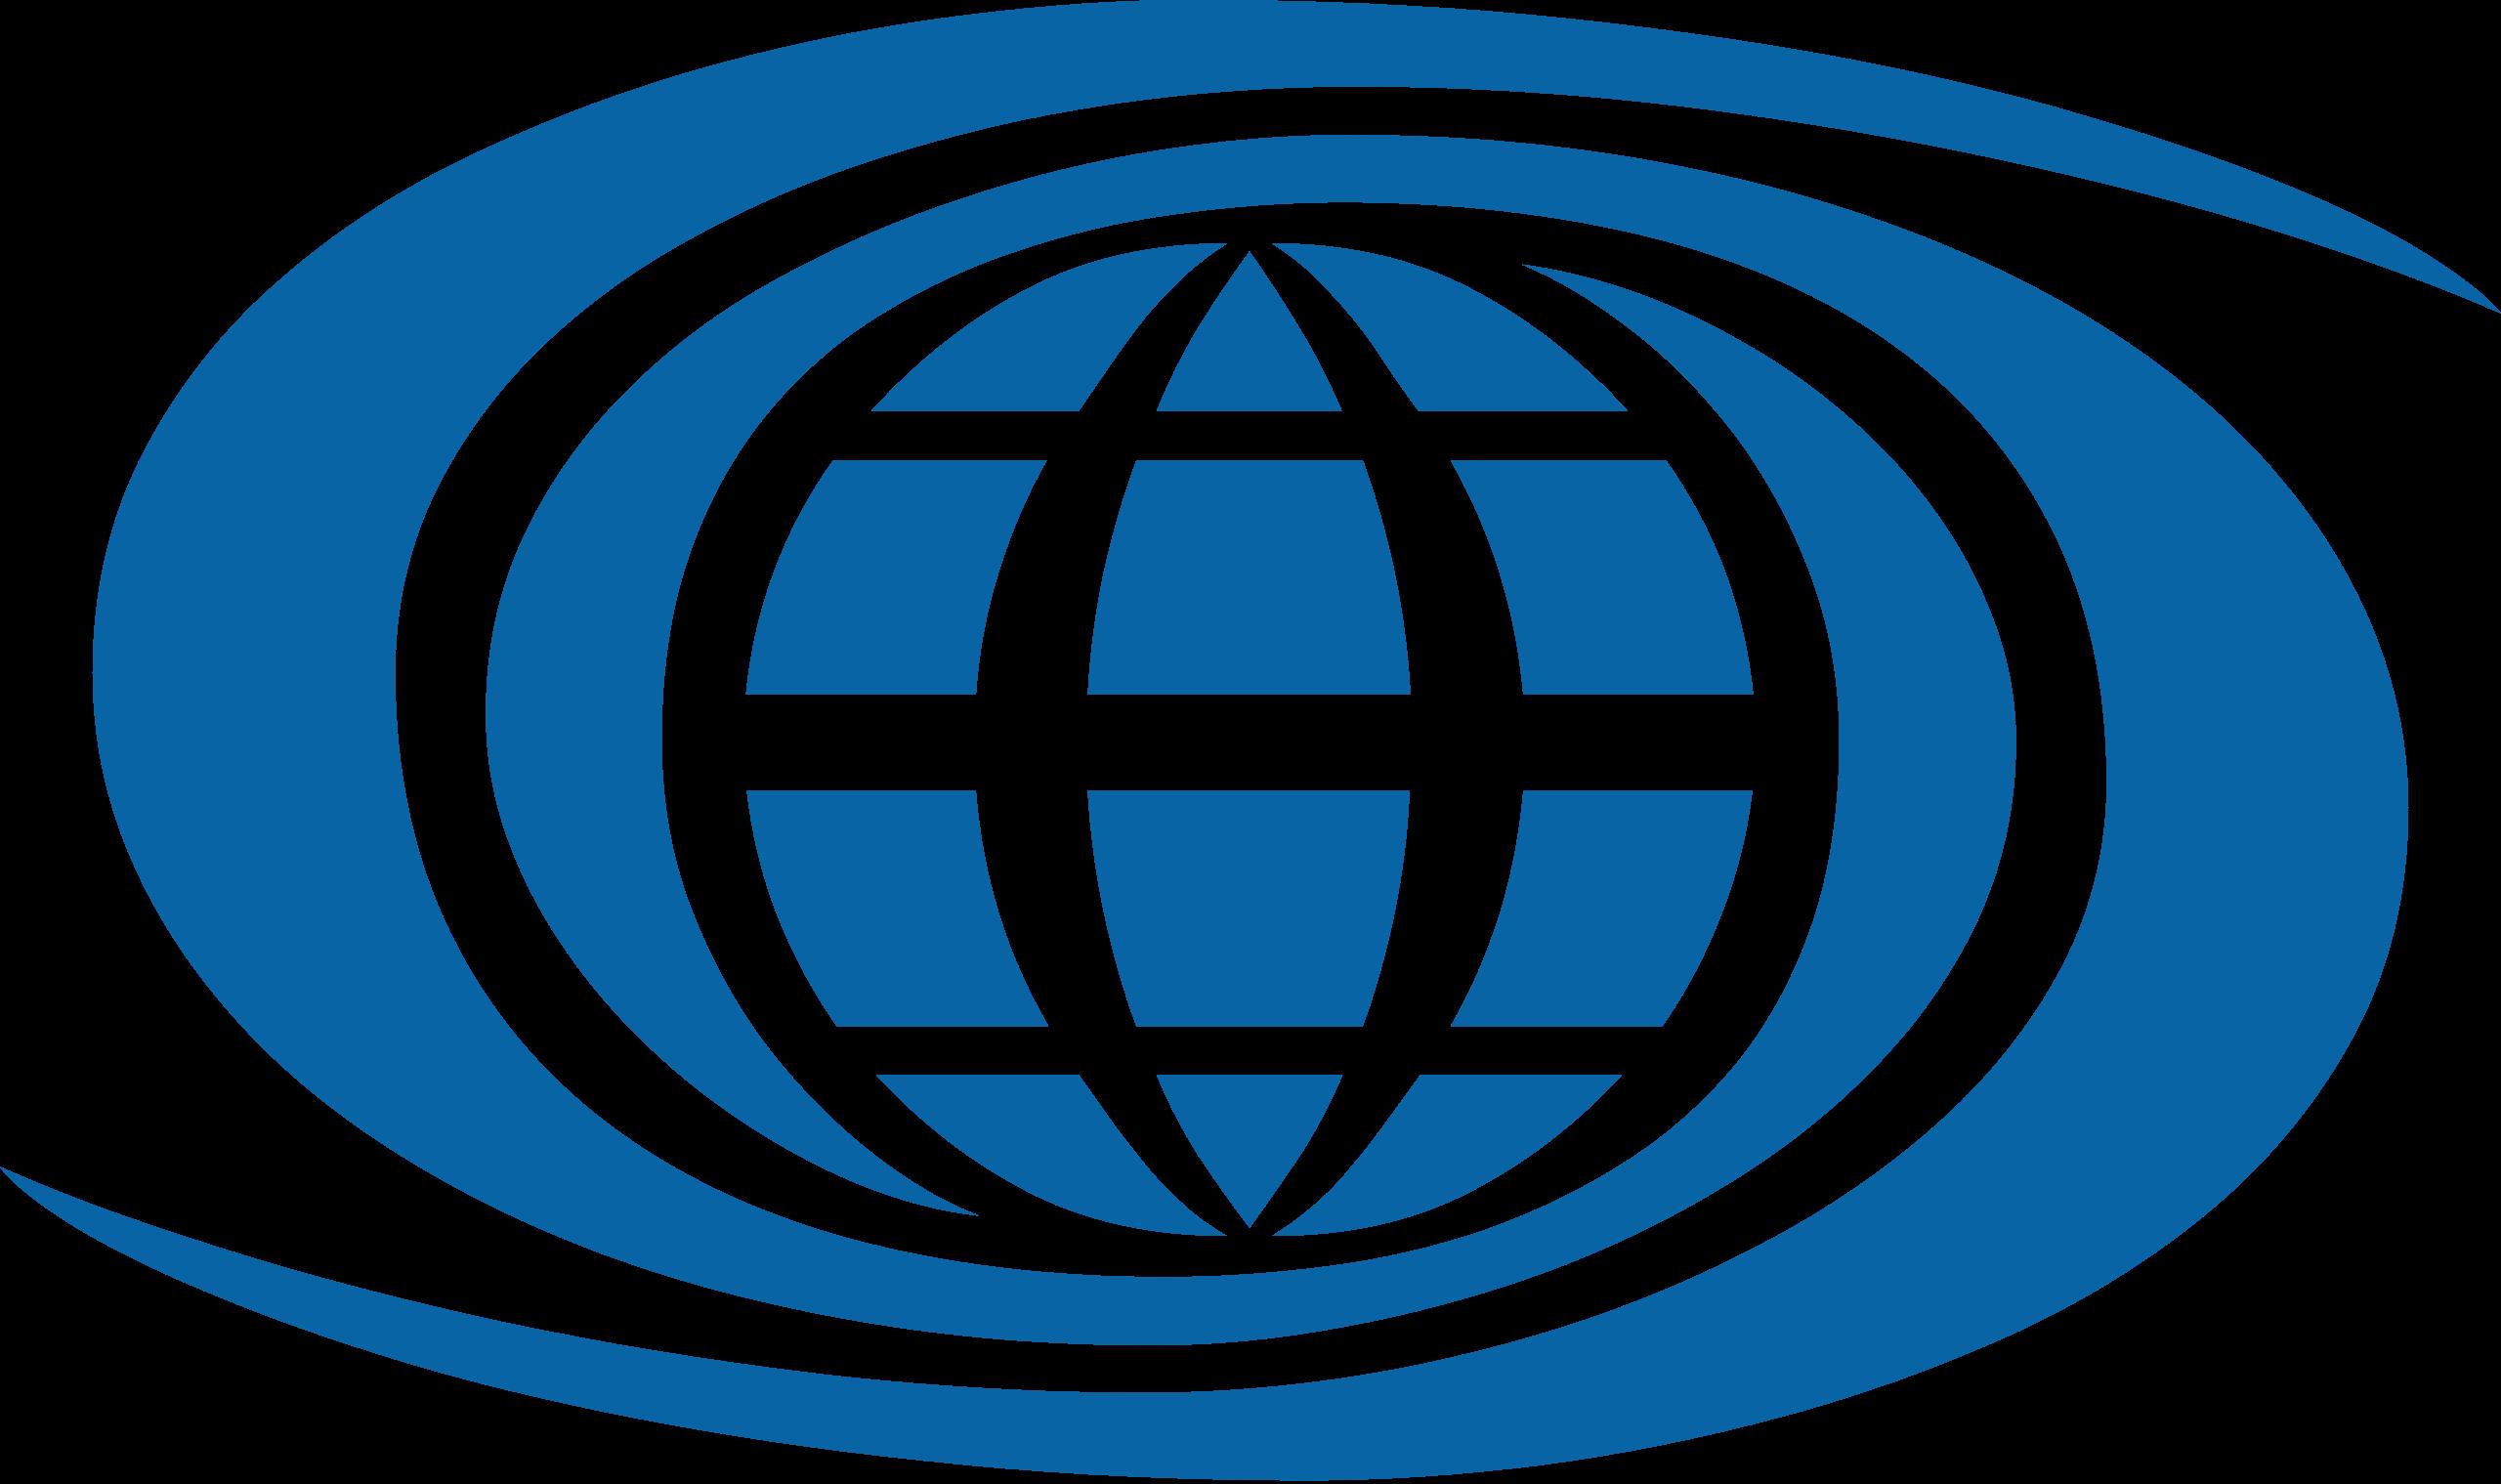 Spaceship Earth Epcot Wikipedia The Free Encyclopedia Spaceship Earth Epcot Earth Logo Spaceship Earth